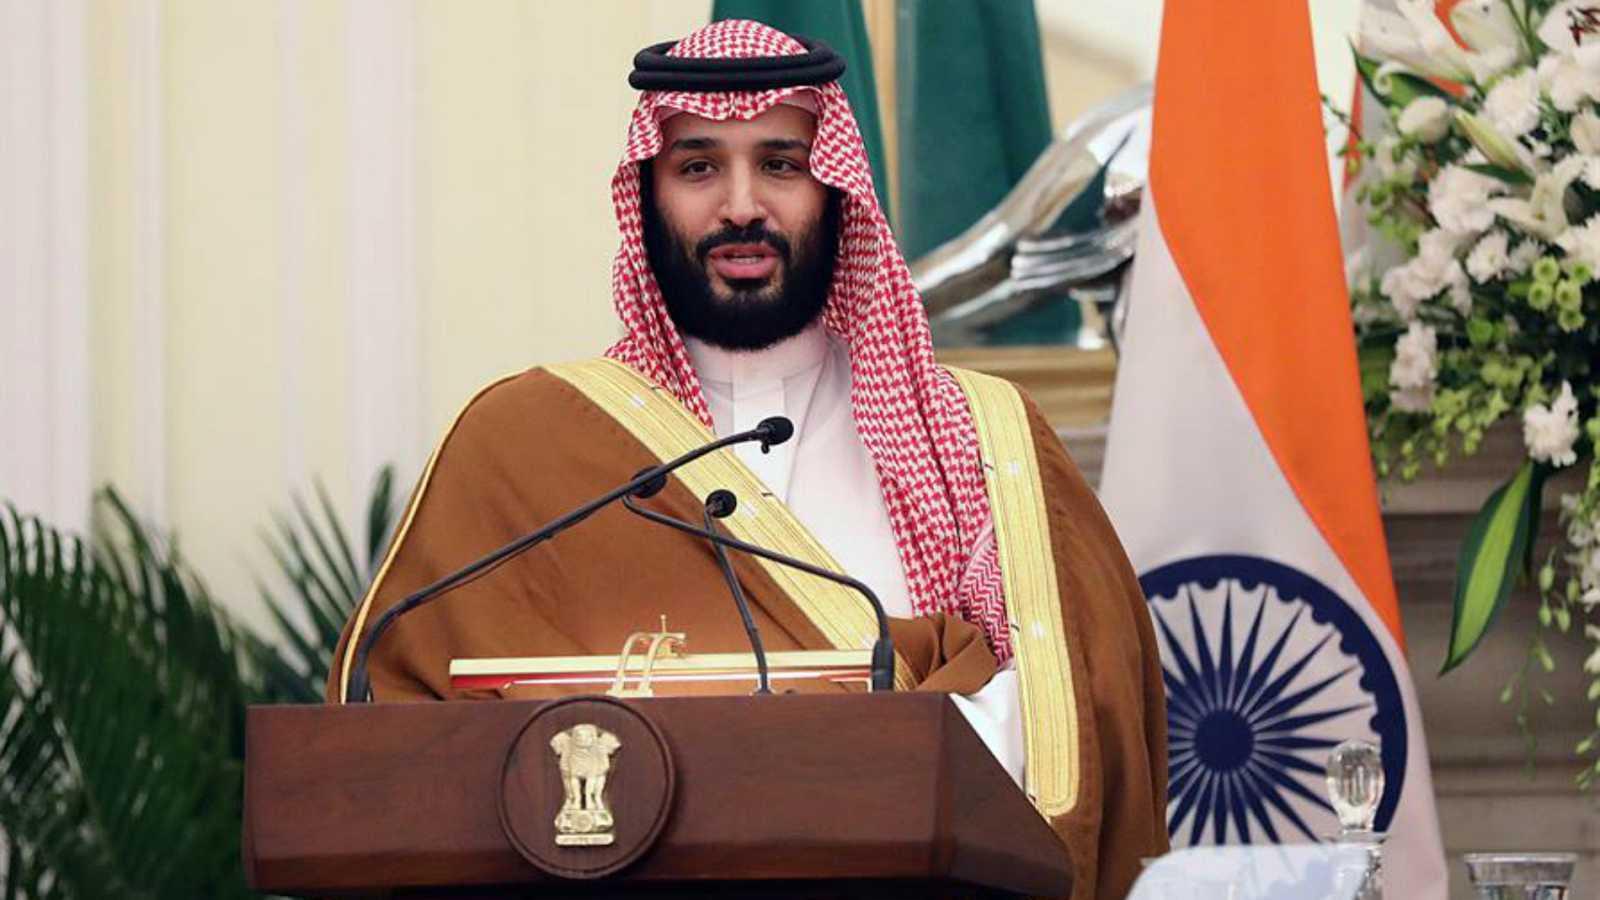 La CIA acusa al príncipe heredero de Arabia Saudí como responsable del asesinato de Khashoggi